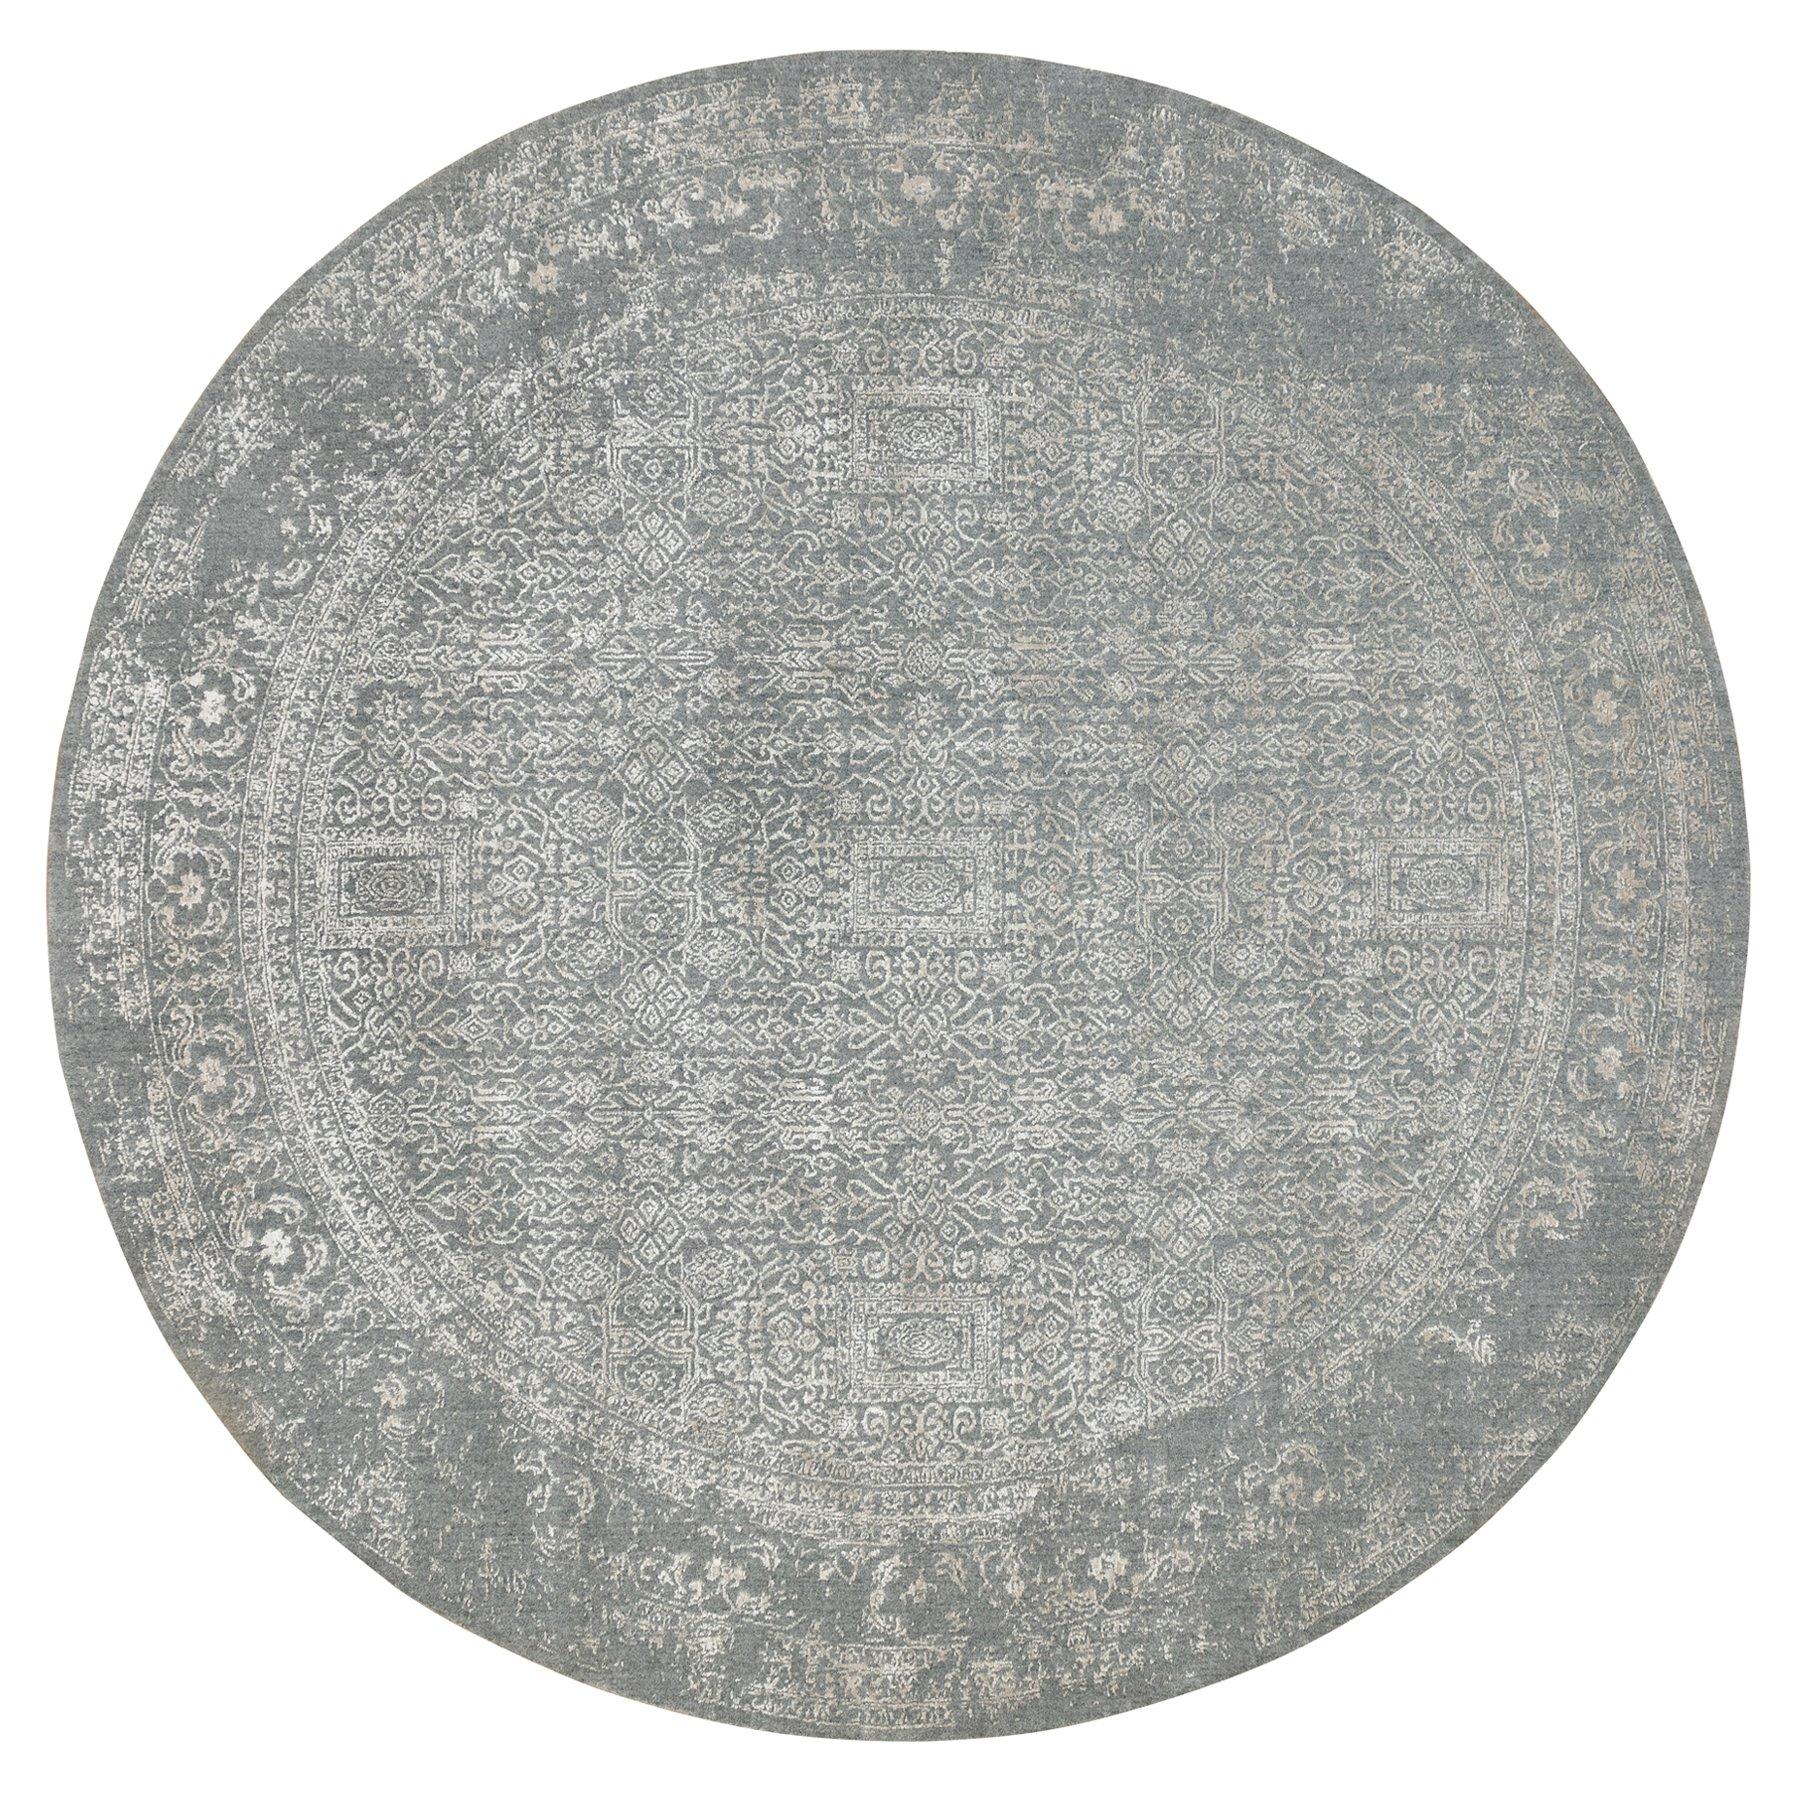 10'x10' Gray Fine jacquard Tone on Tone Hand Loomed Modern Wool and Art Silk Round Oriental Rug